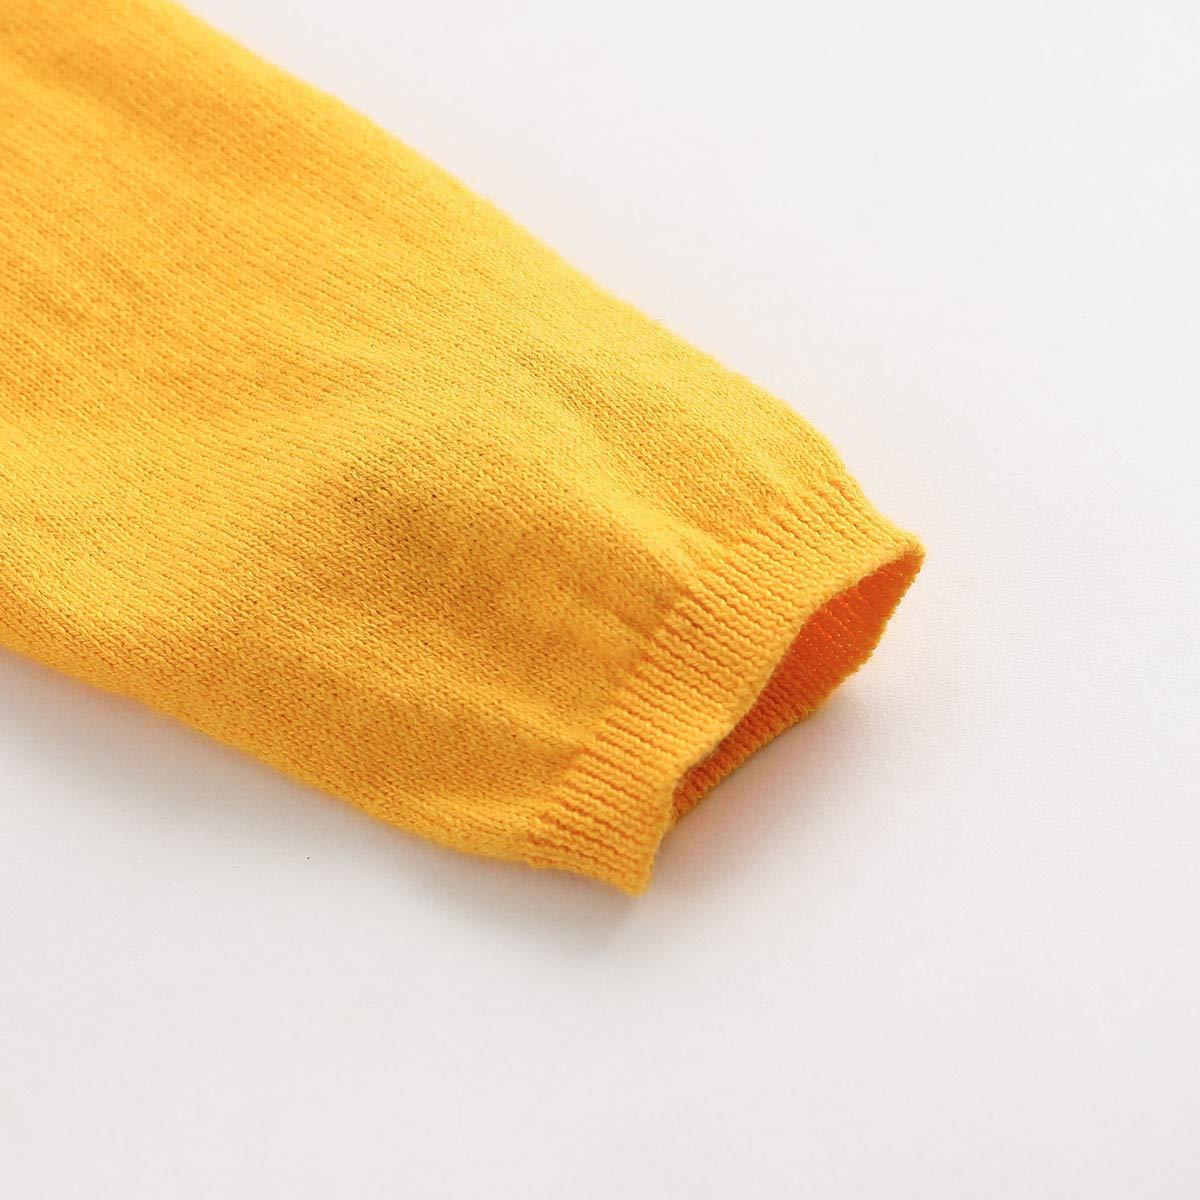 marc janie Girls Cotton Solid Knitting Cardigan